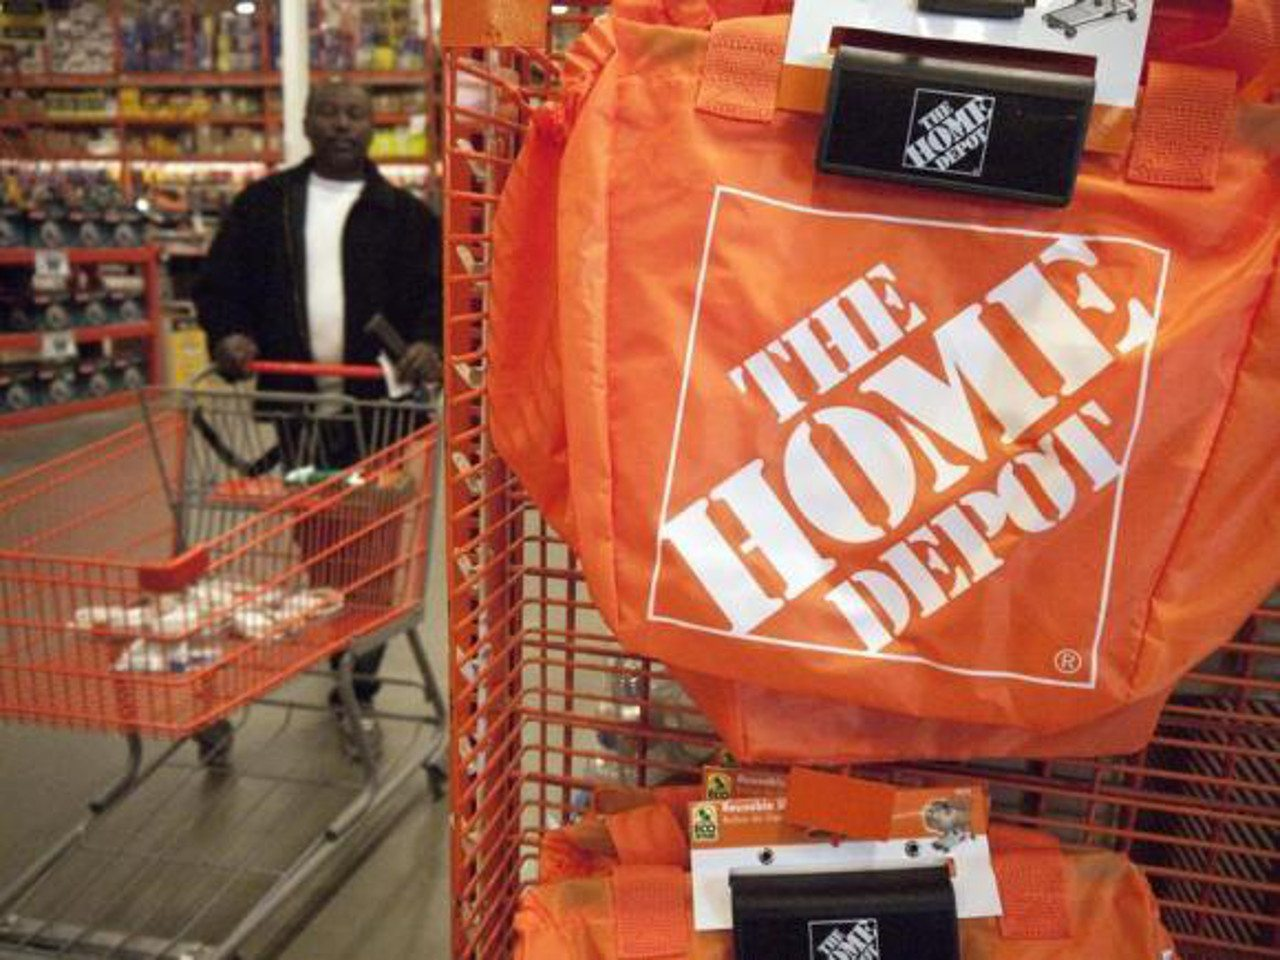 Home Depot quiere llevar proveedores mexicanos a EU